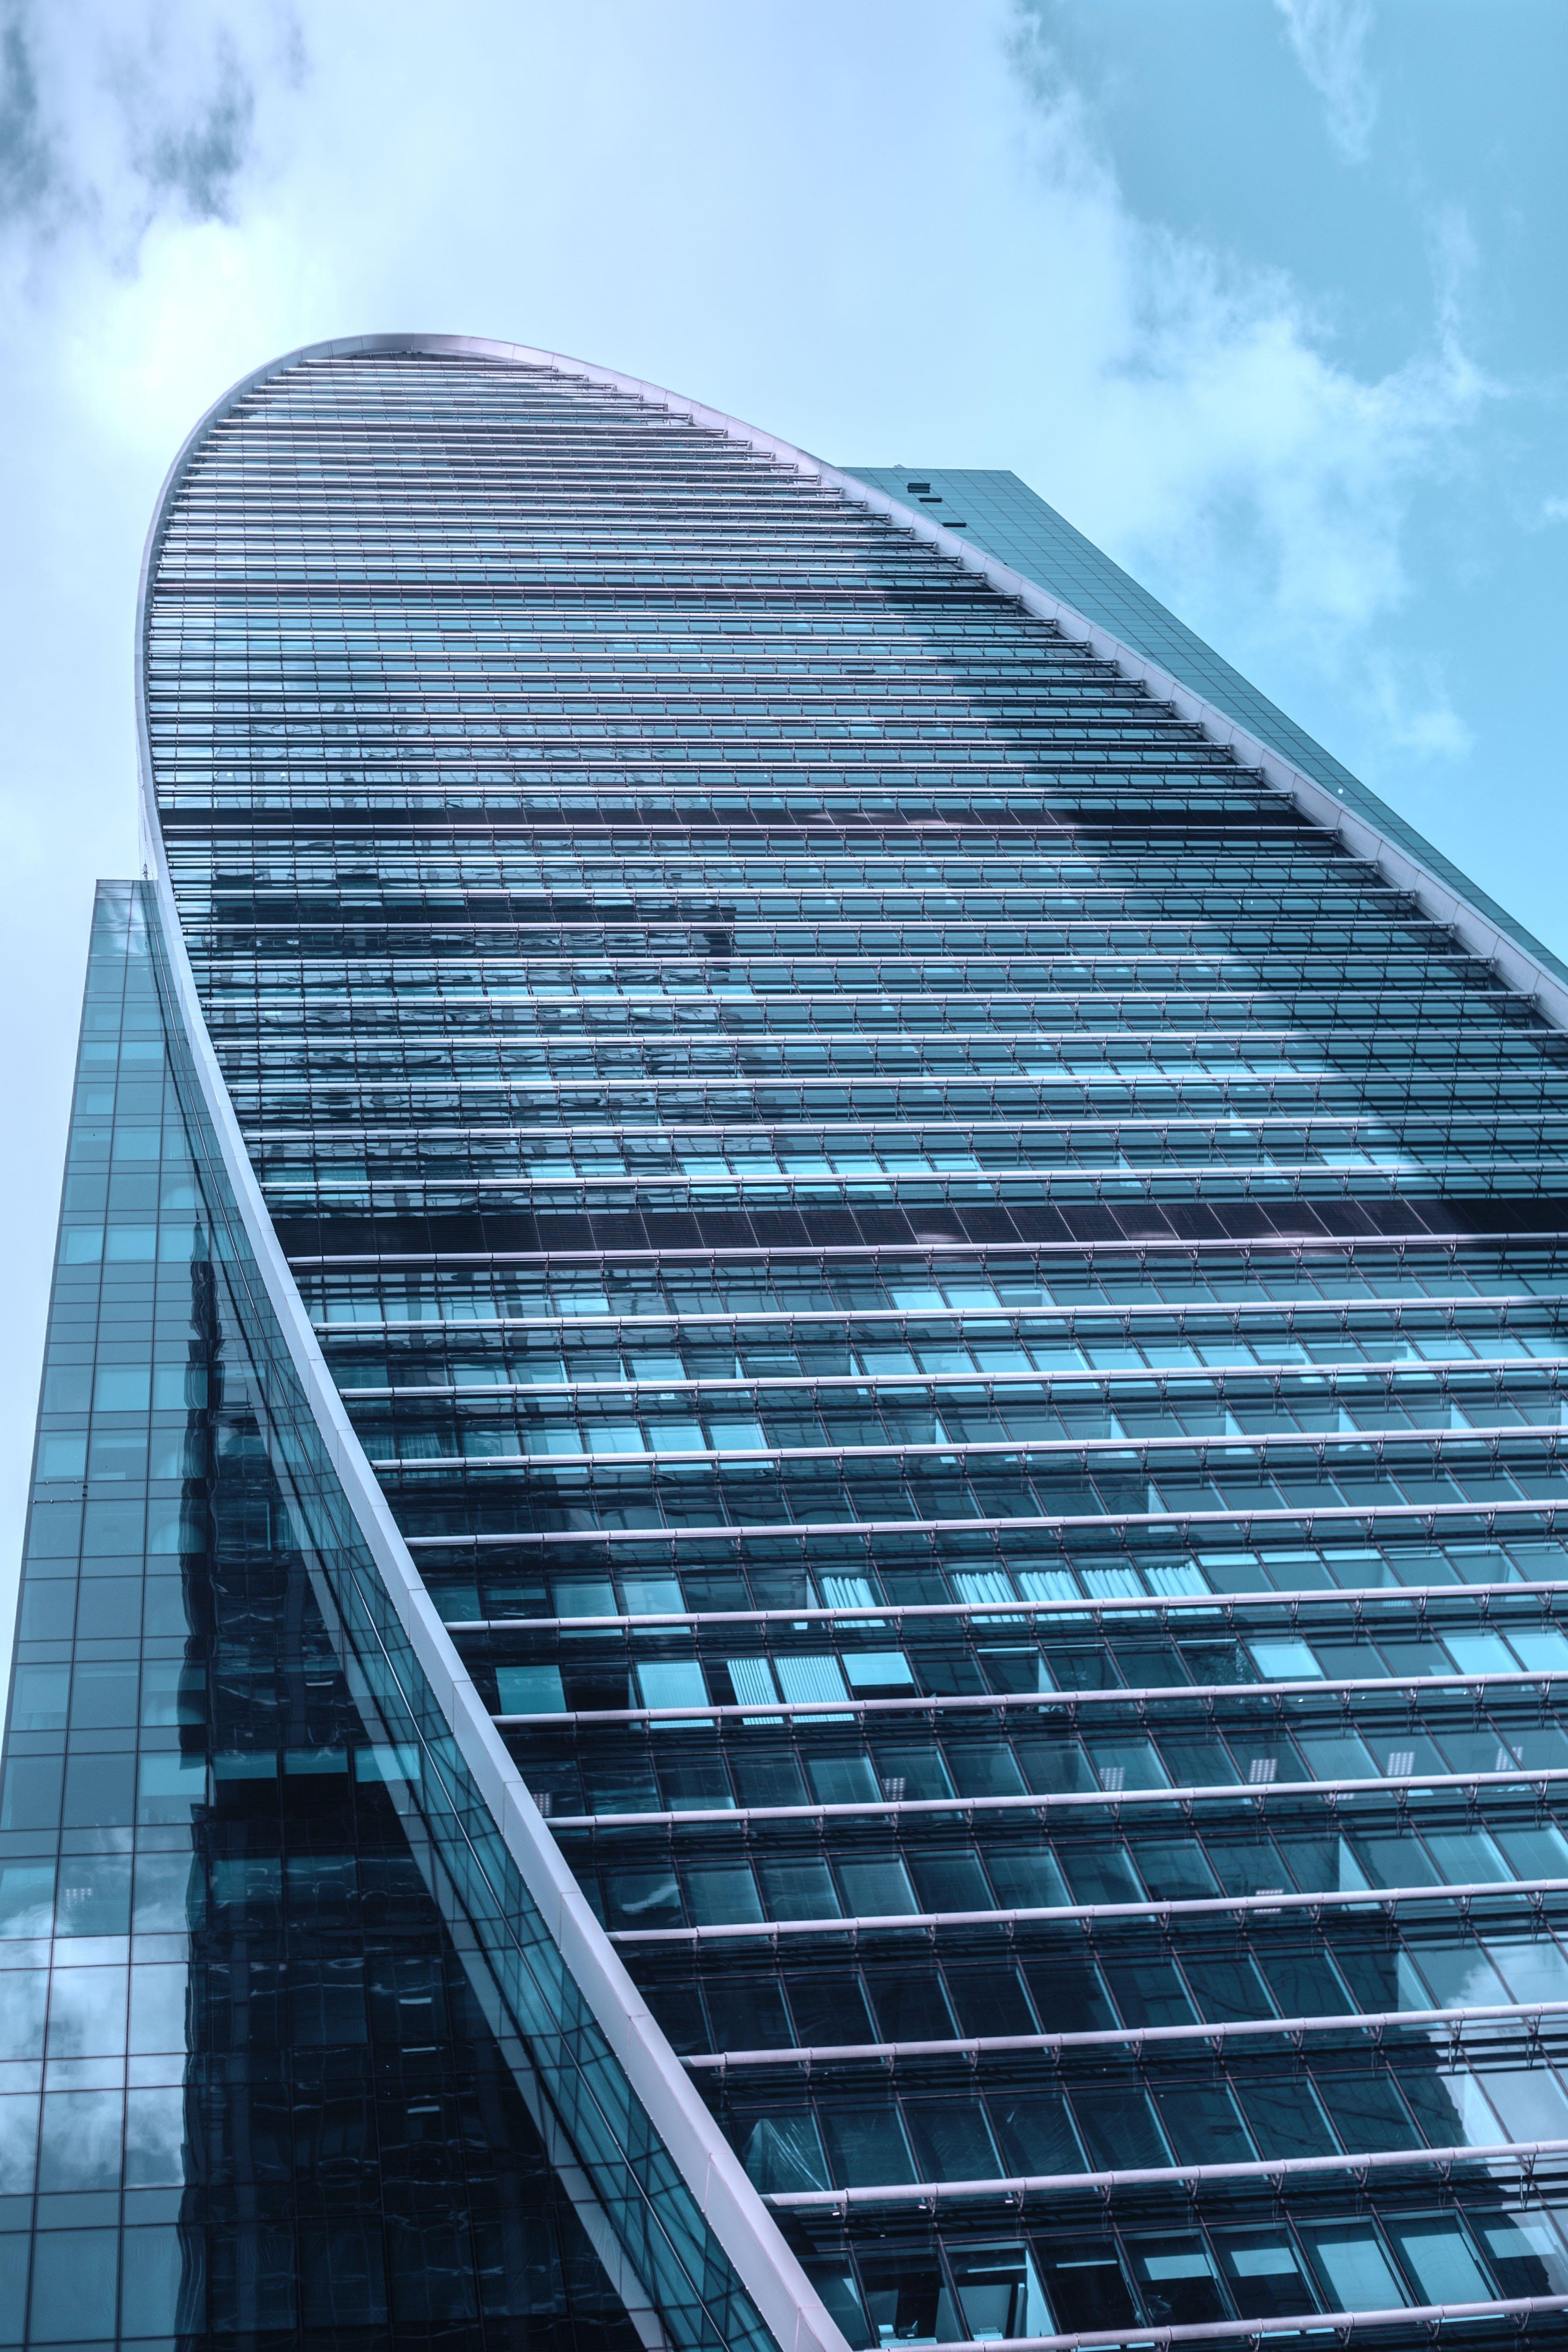 architecture, building, glass